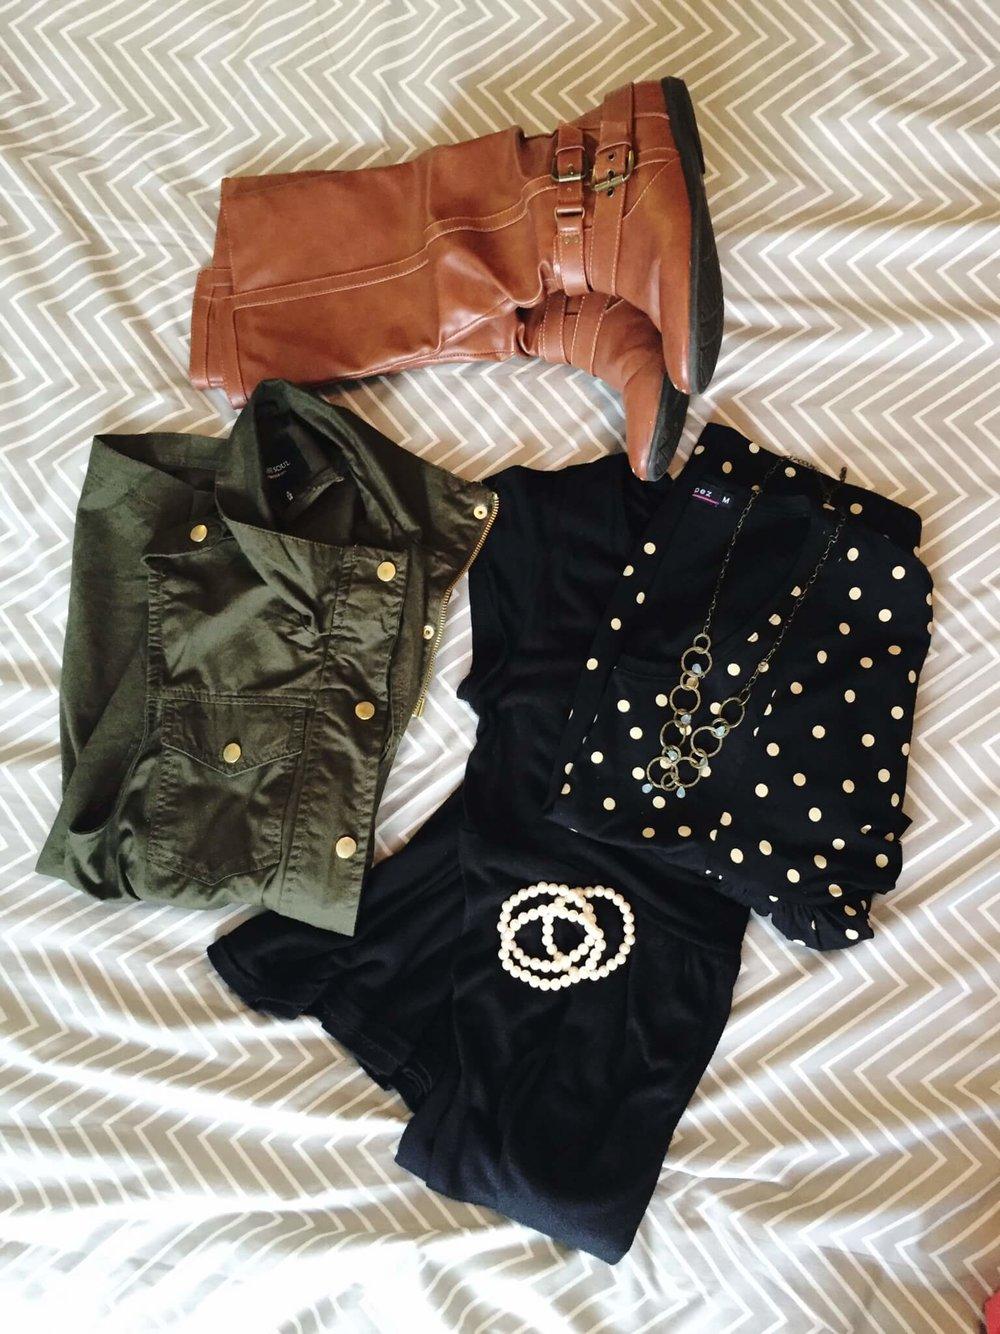 Dress + Tee + Utility Vest + Boots